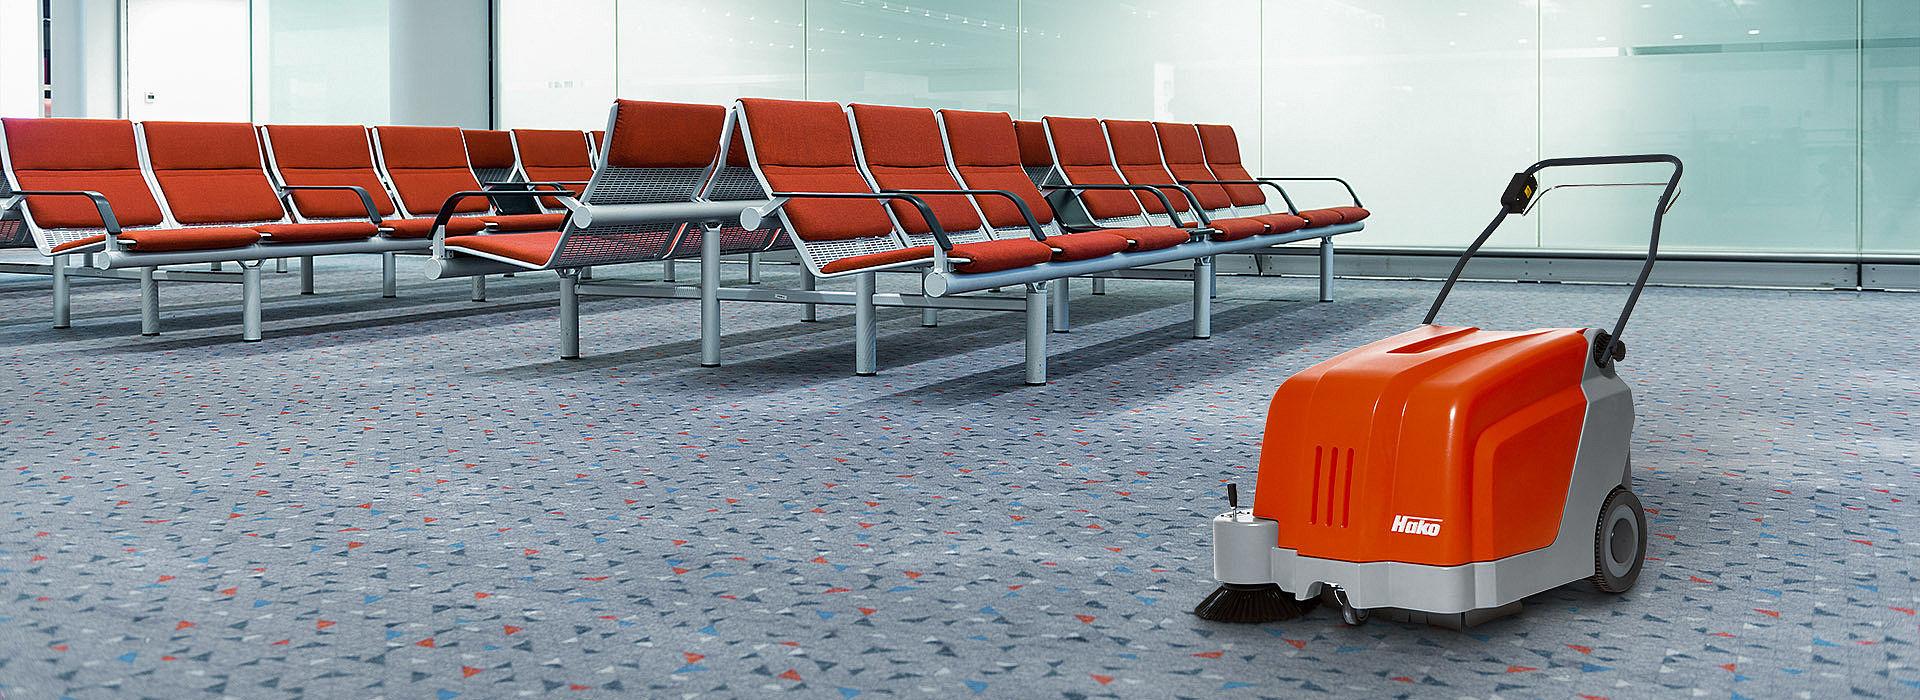 Header_Sweepmaster_B500_Airport